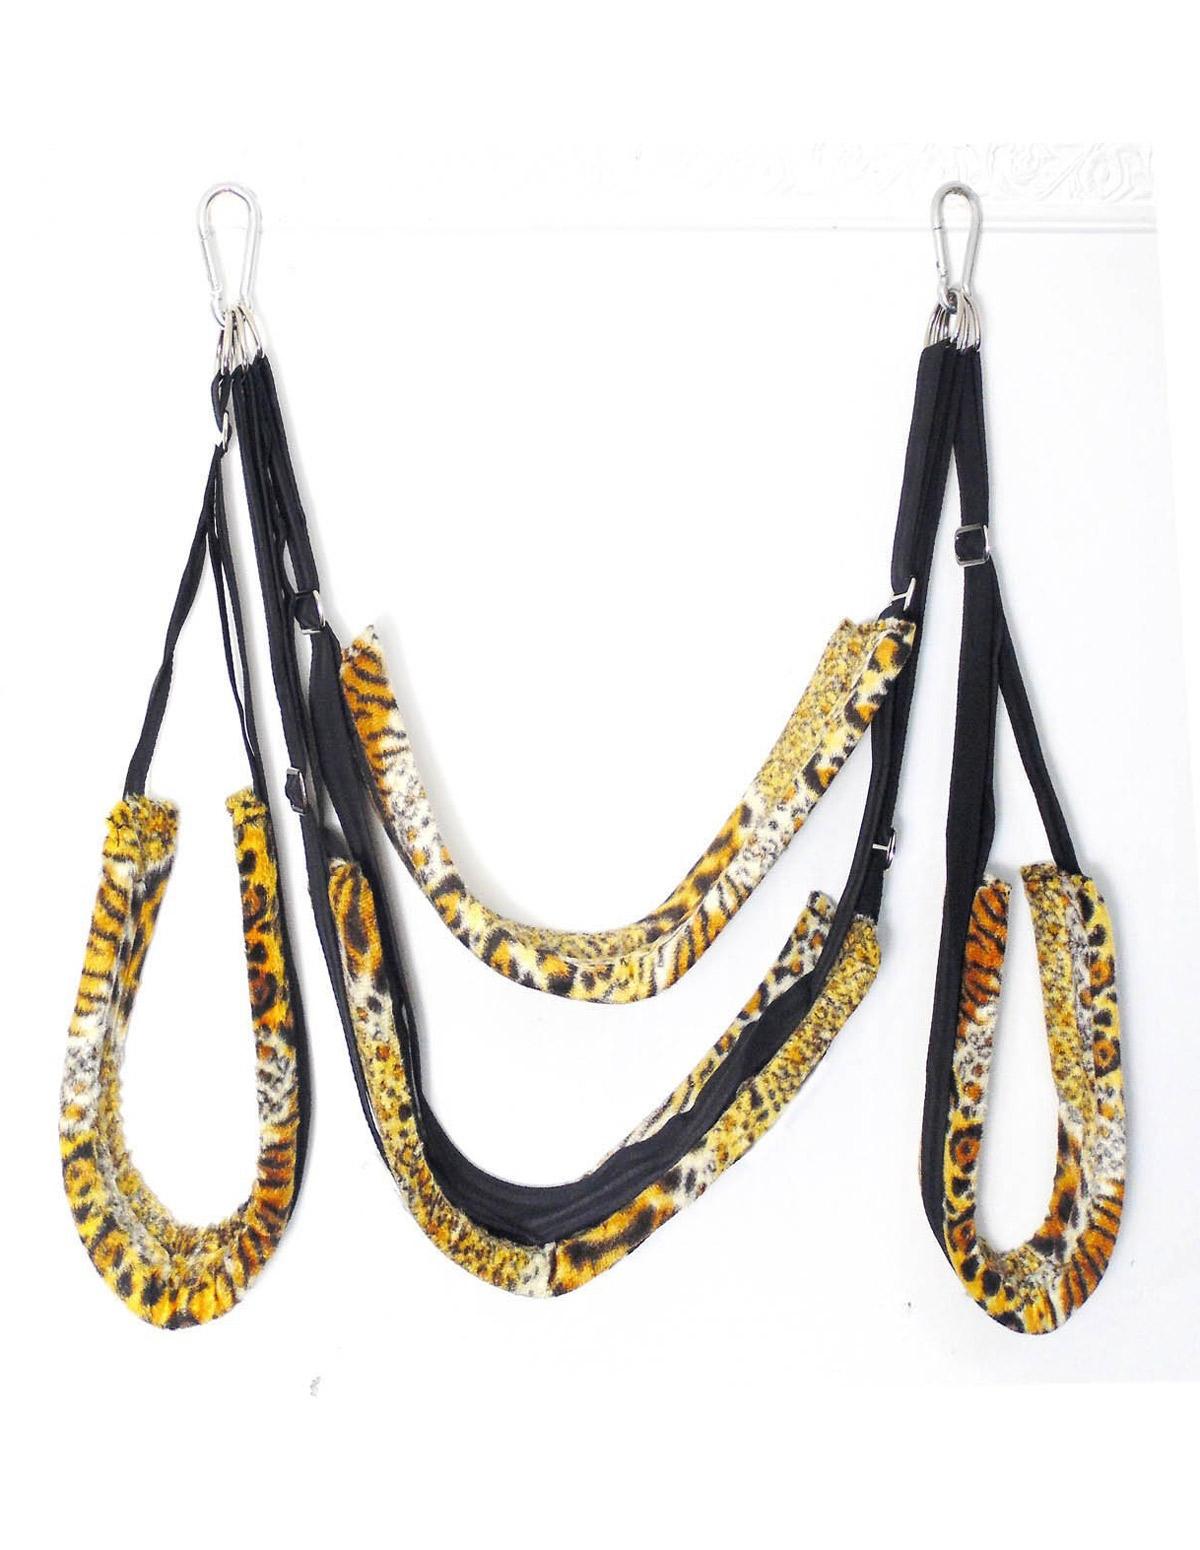 Whip Smart Pleasure Swing Cheetah